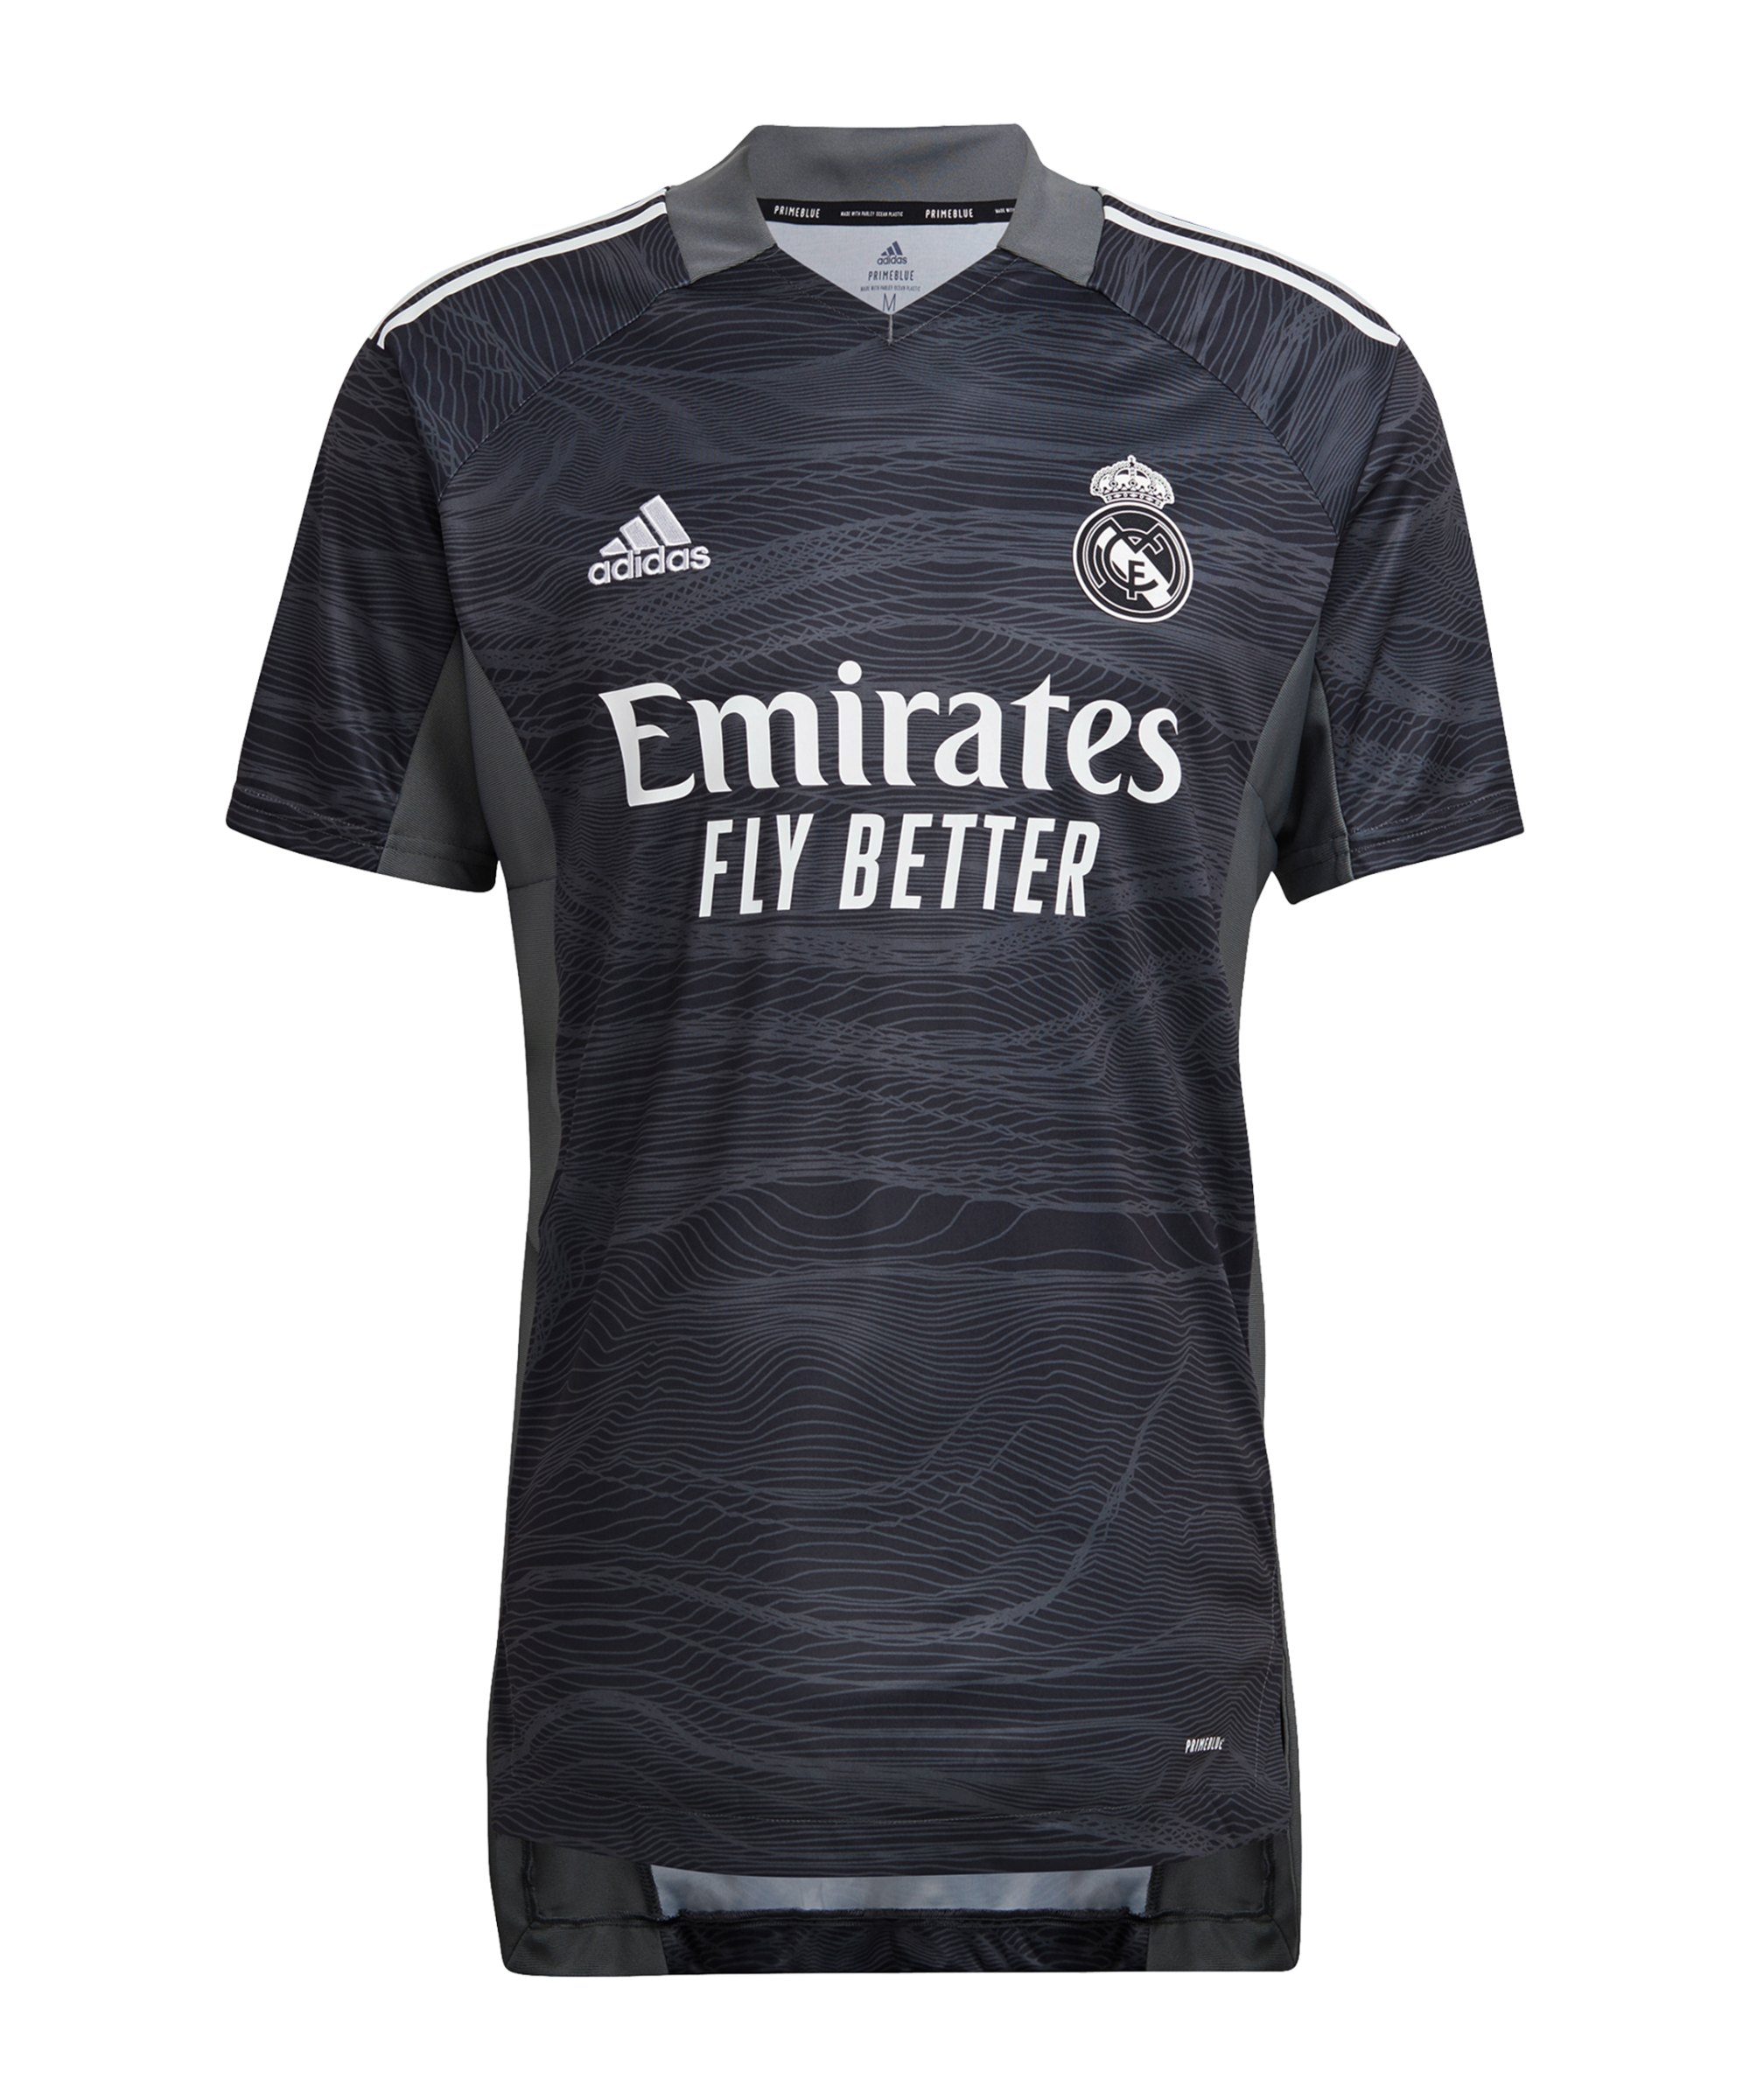 adidas Real Madrid TW-Trikot Home 2021/2022 Schwarz - schwarz